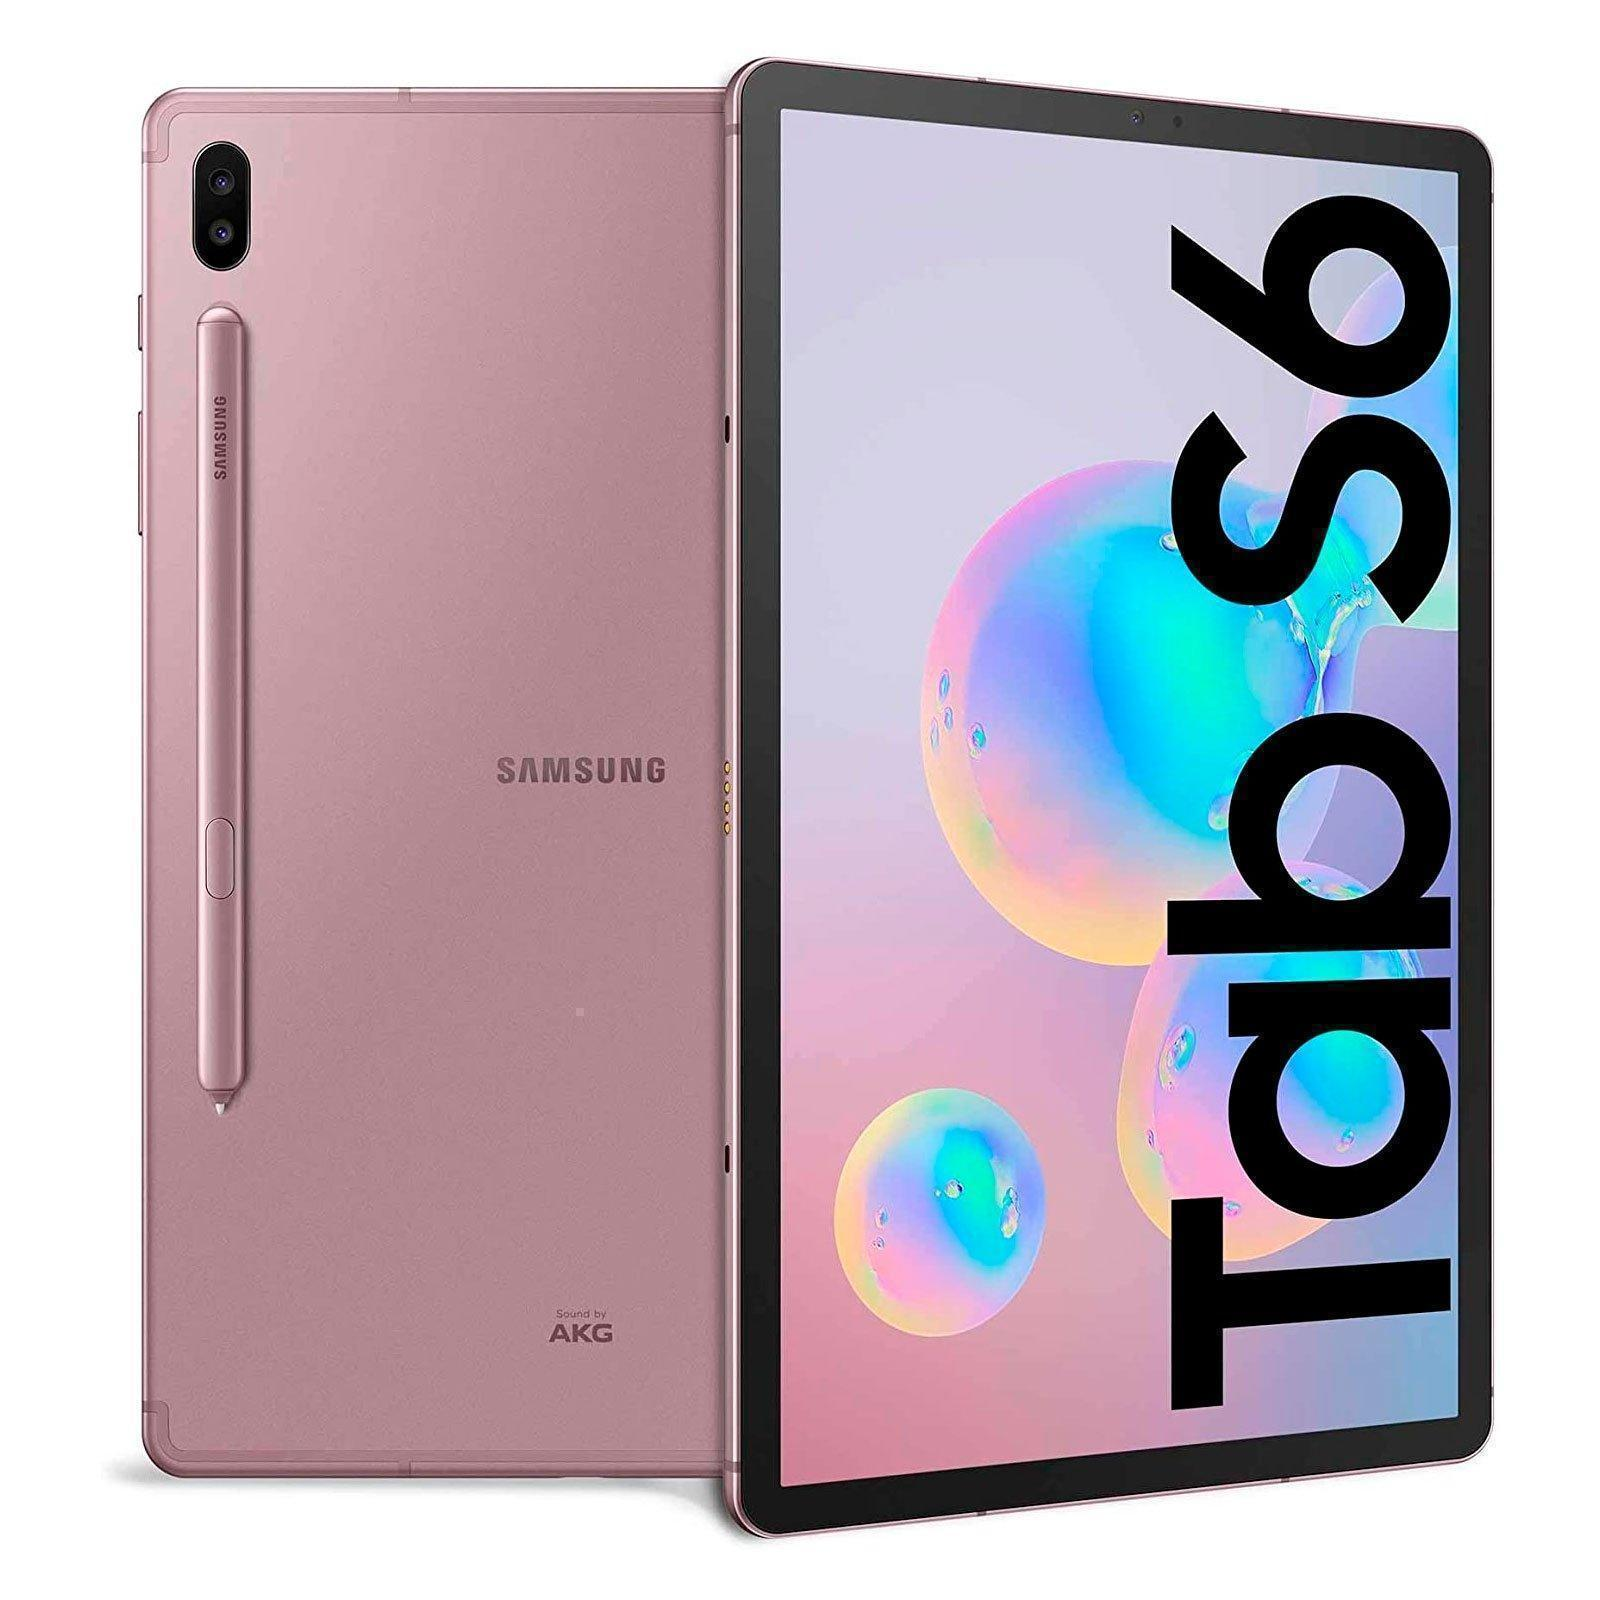 Galaxy Tab S6 (2019) - WiFi